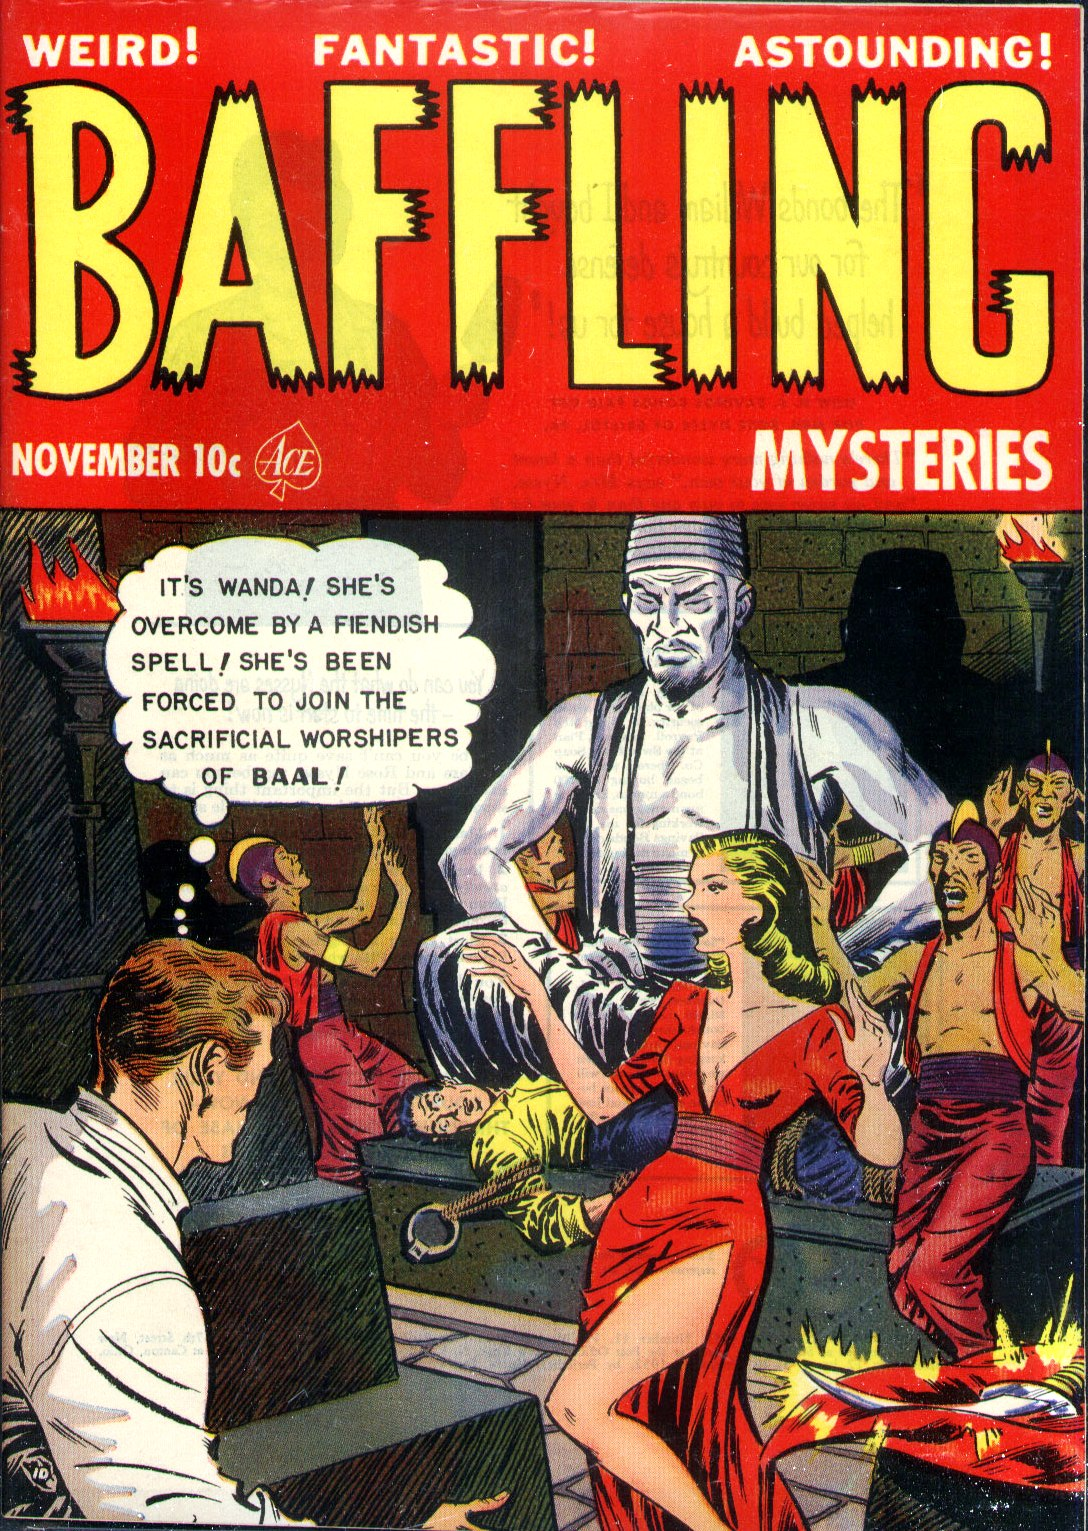 Baffling Mysteries Vol 1 11